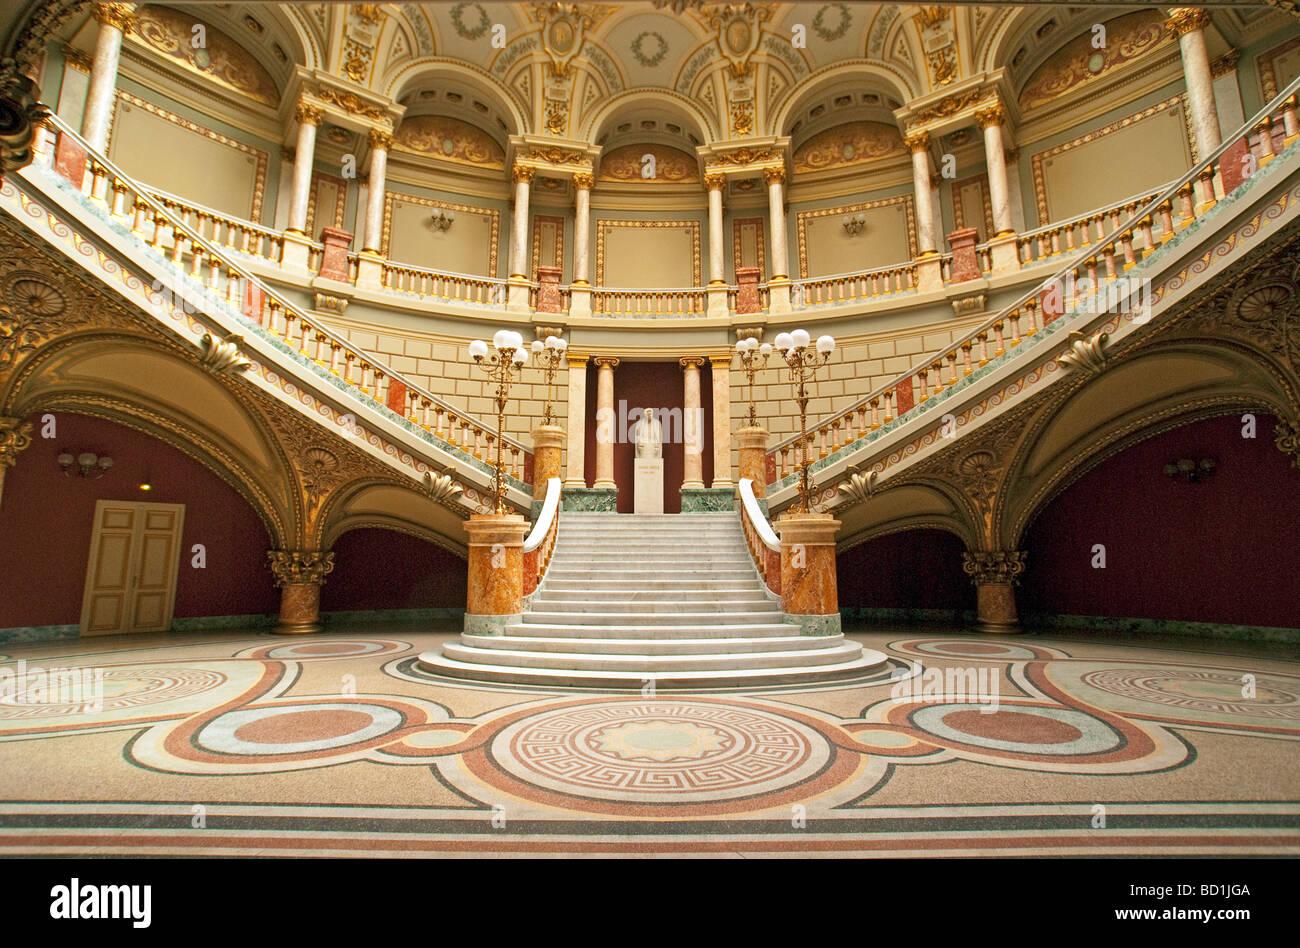 Bucarest Romanian Athenaeum Concert Hall in stile neoclassico Foto Stock